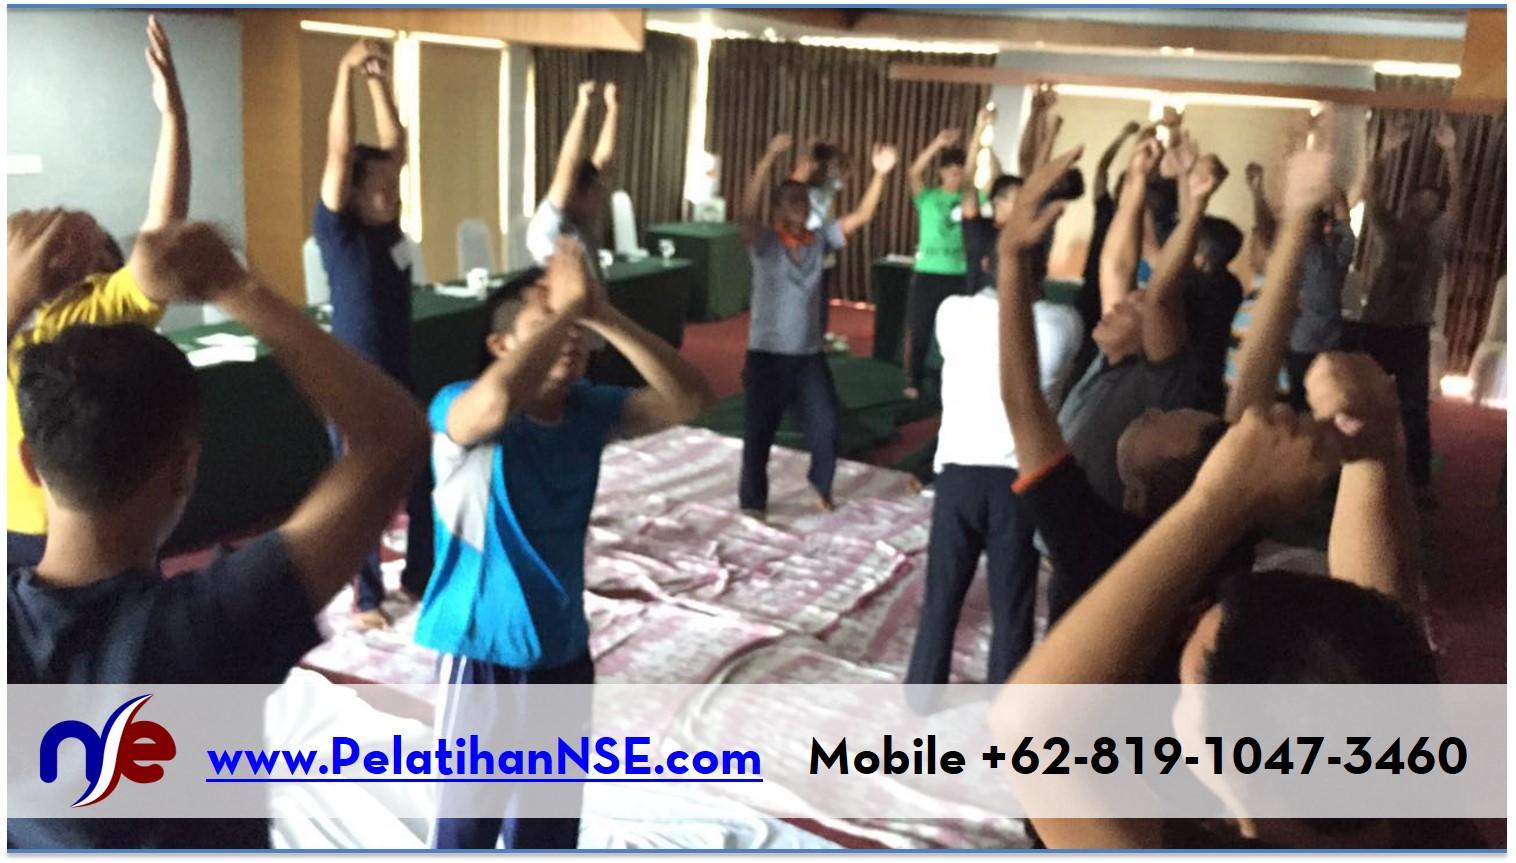 NSE Basic Self Empowerment KAI 1-2 Agustus 2016 - Merayakan Kehidupan setelah TherFA.jpeg